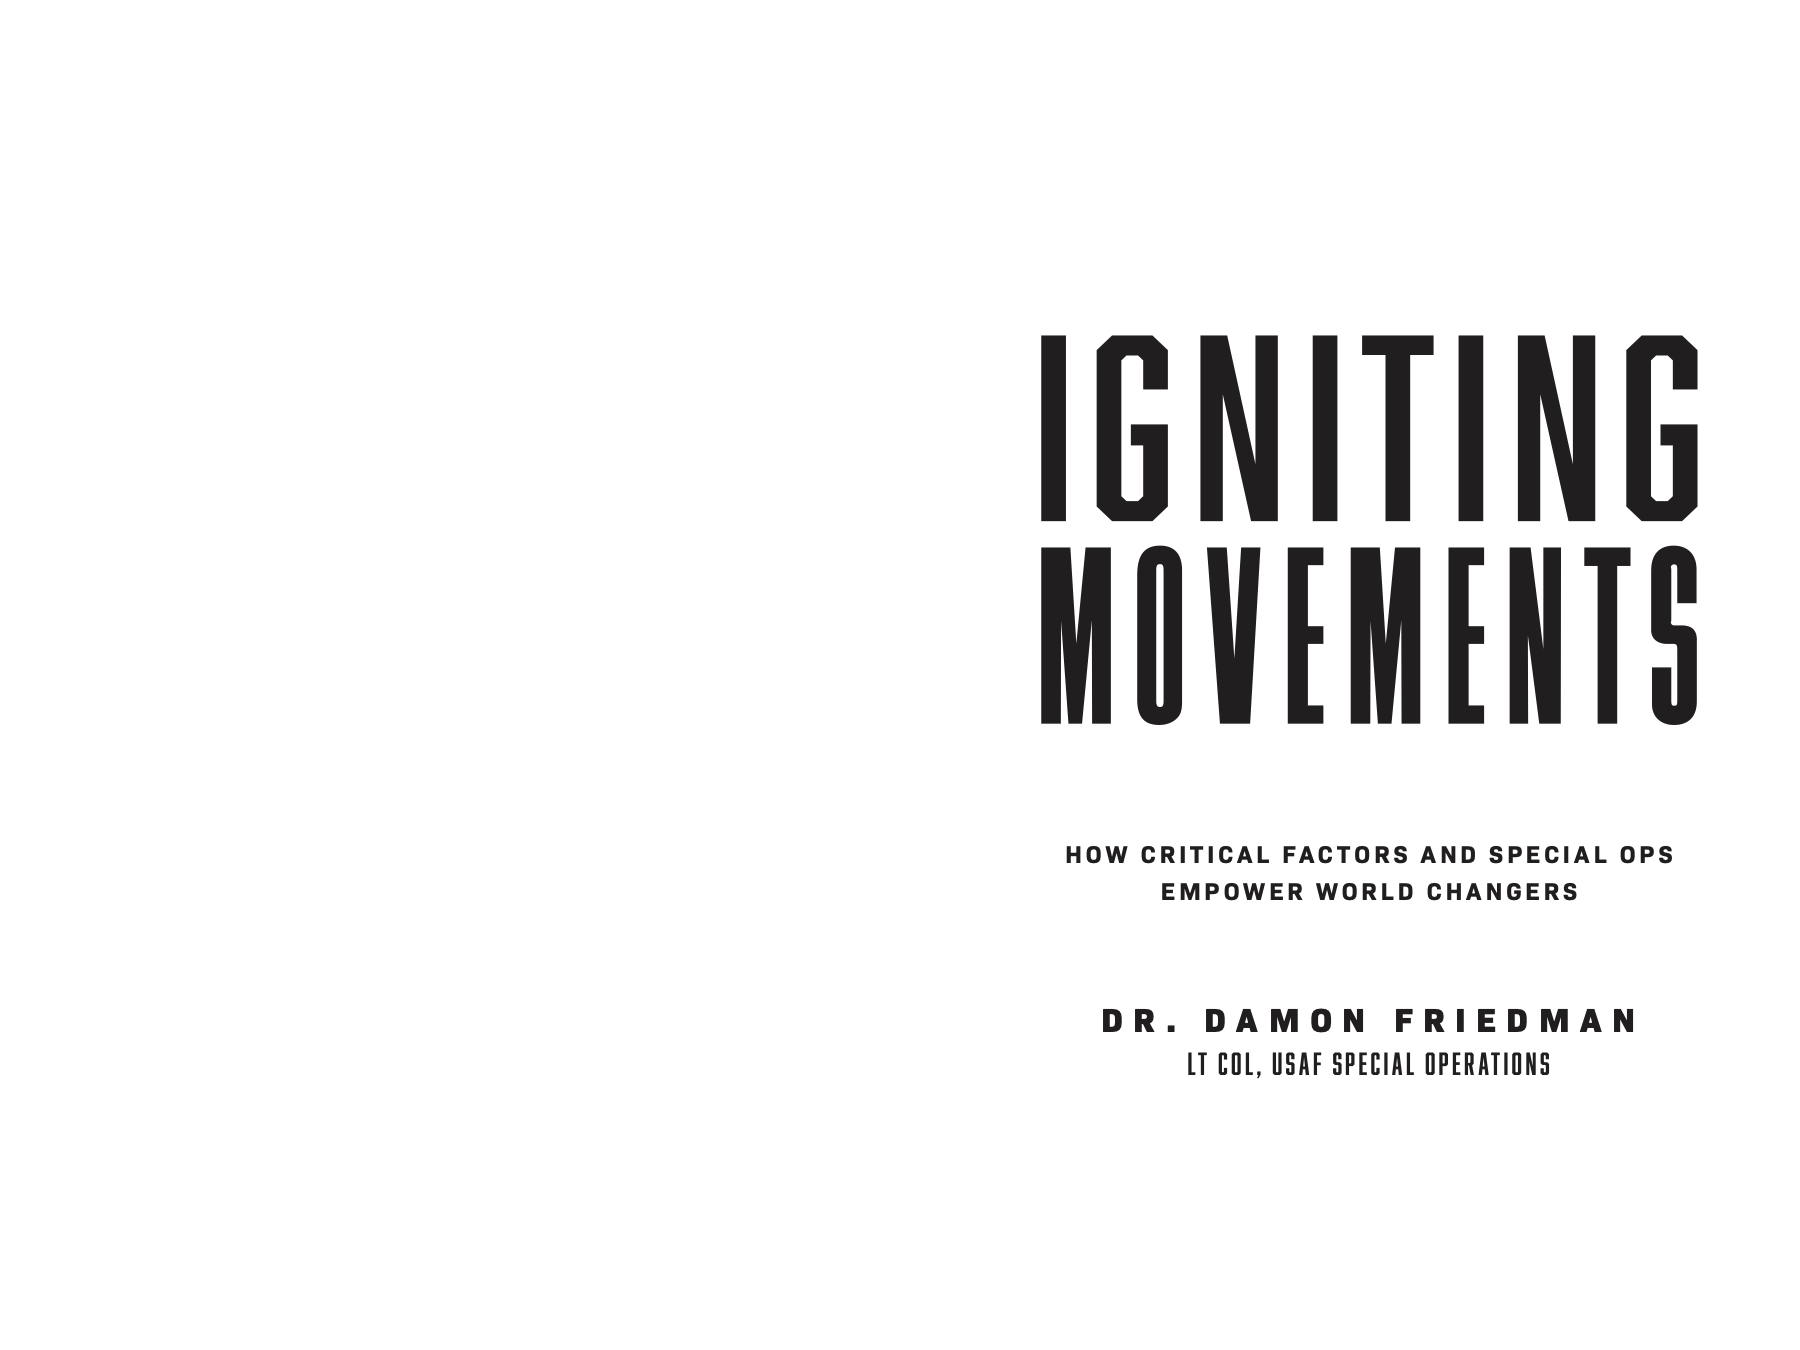 Friedman_IgnitingMovements_FullCover_Interior 2